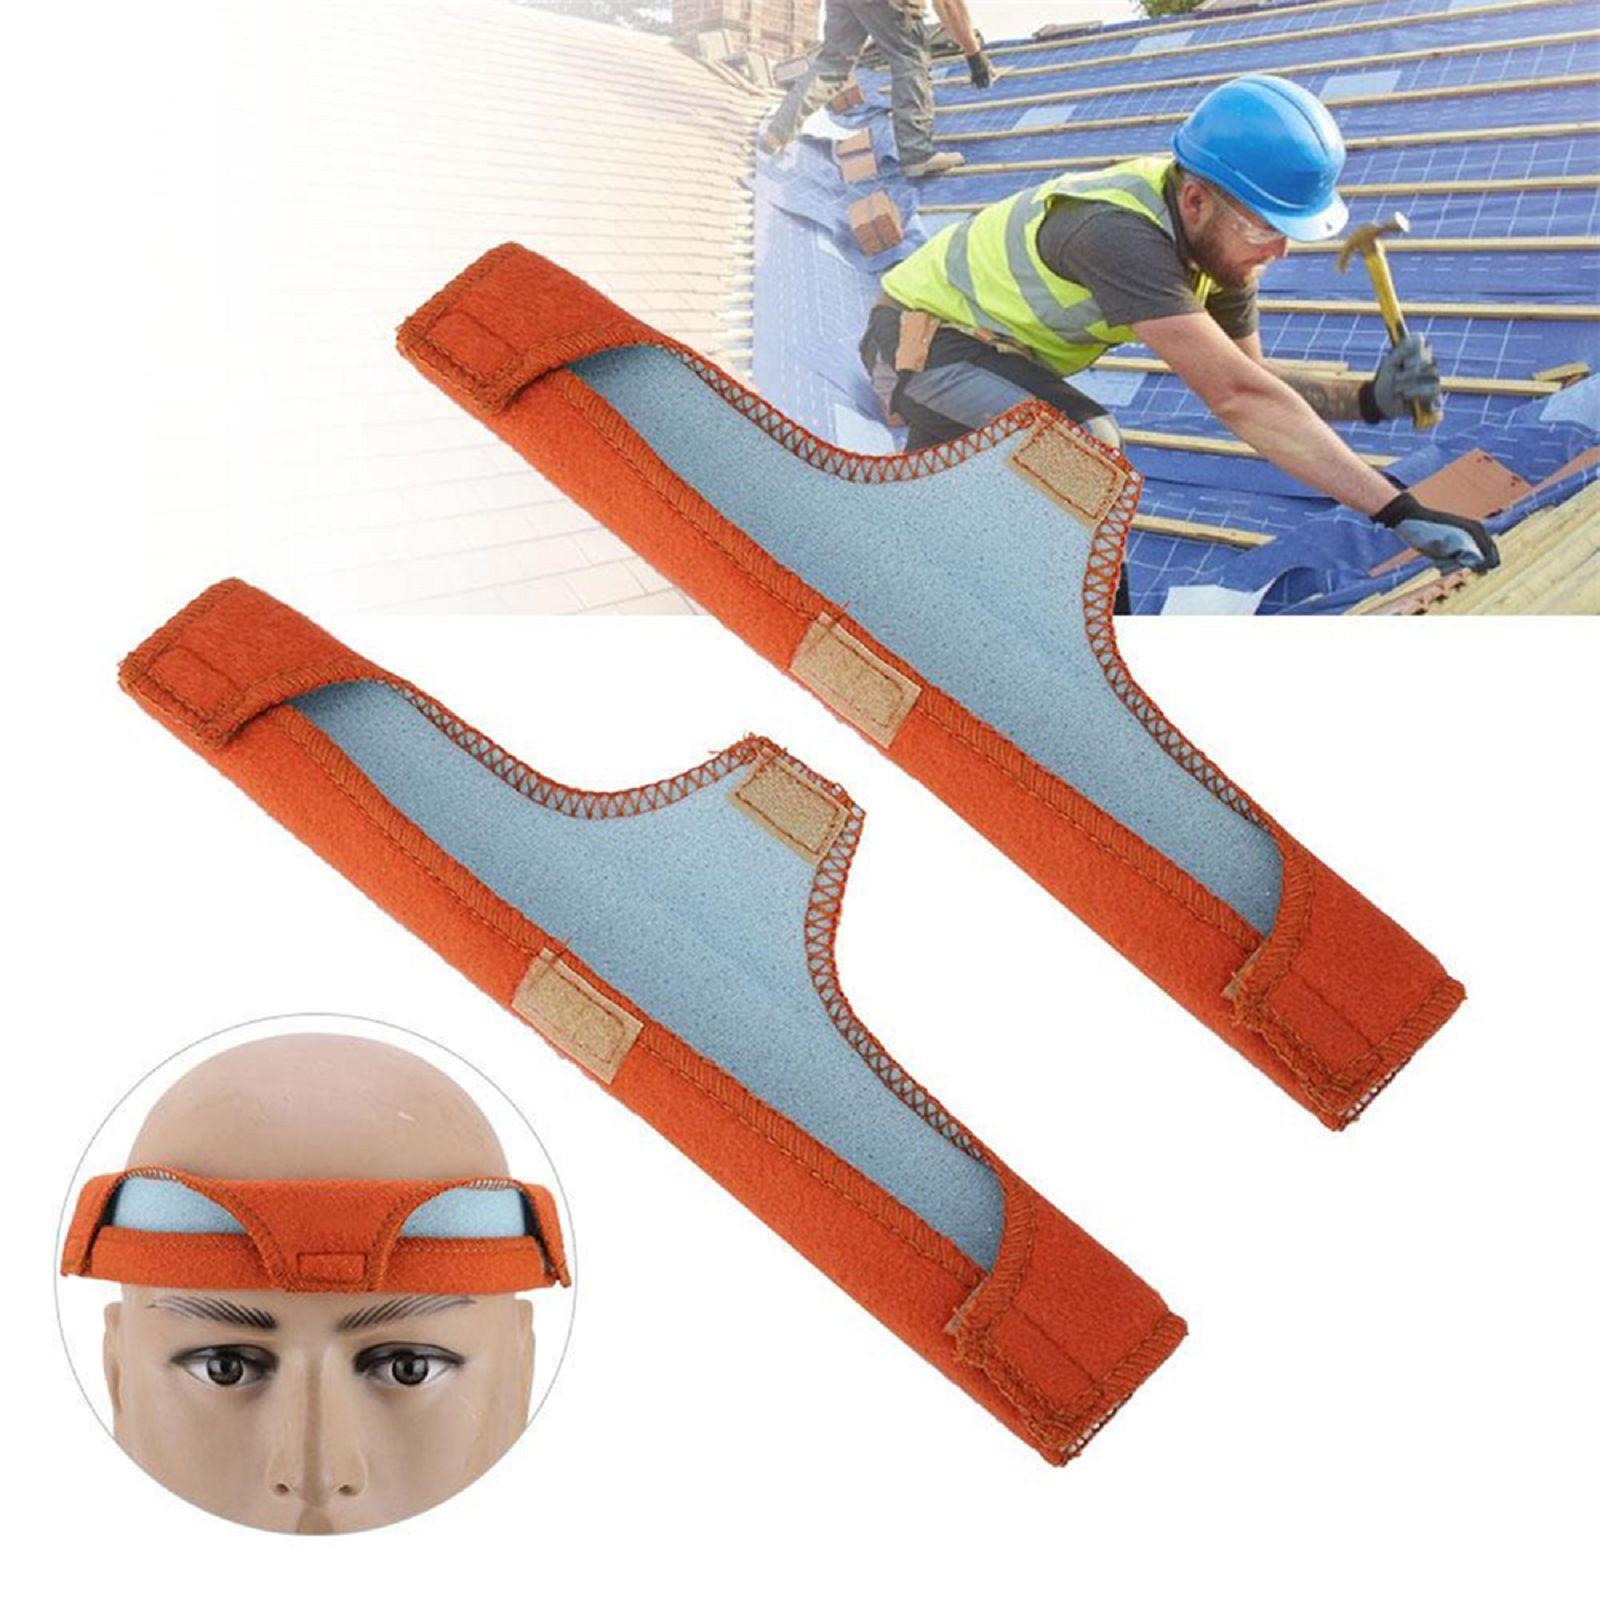 2pcs Sweatband Sweat Band for Hard Hat Safety Helmet Welding Helmet